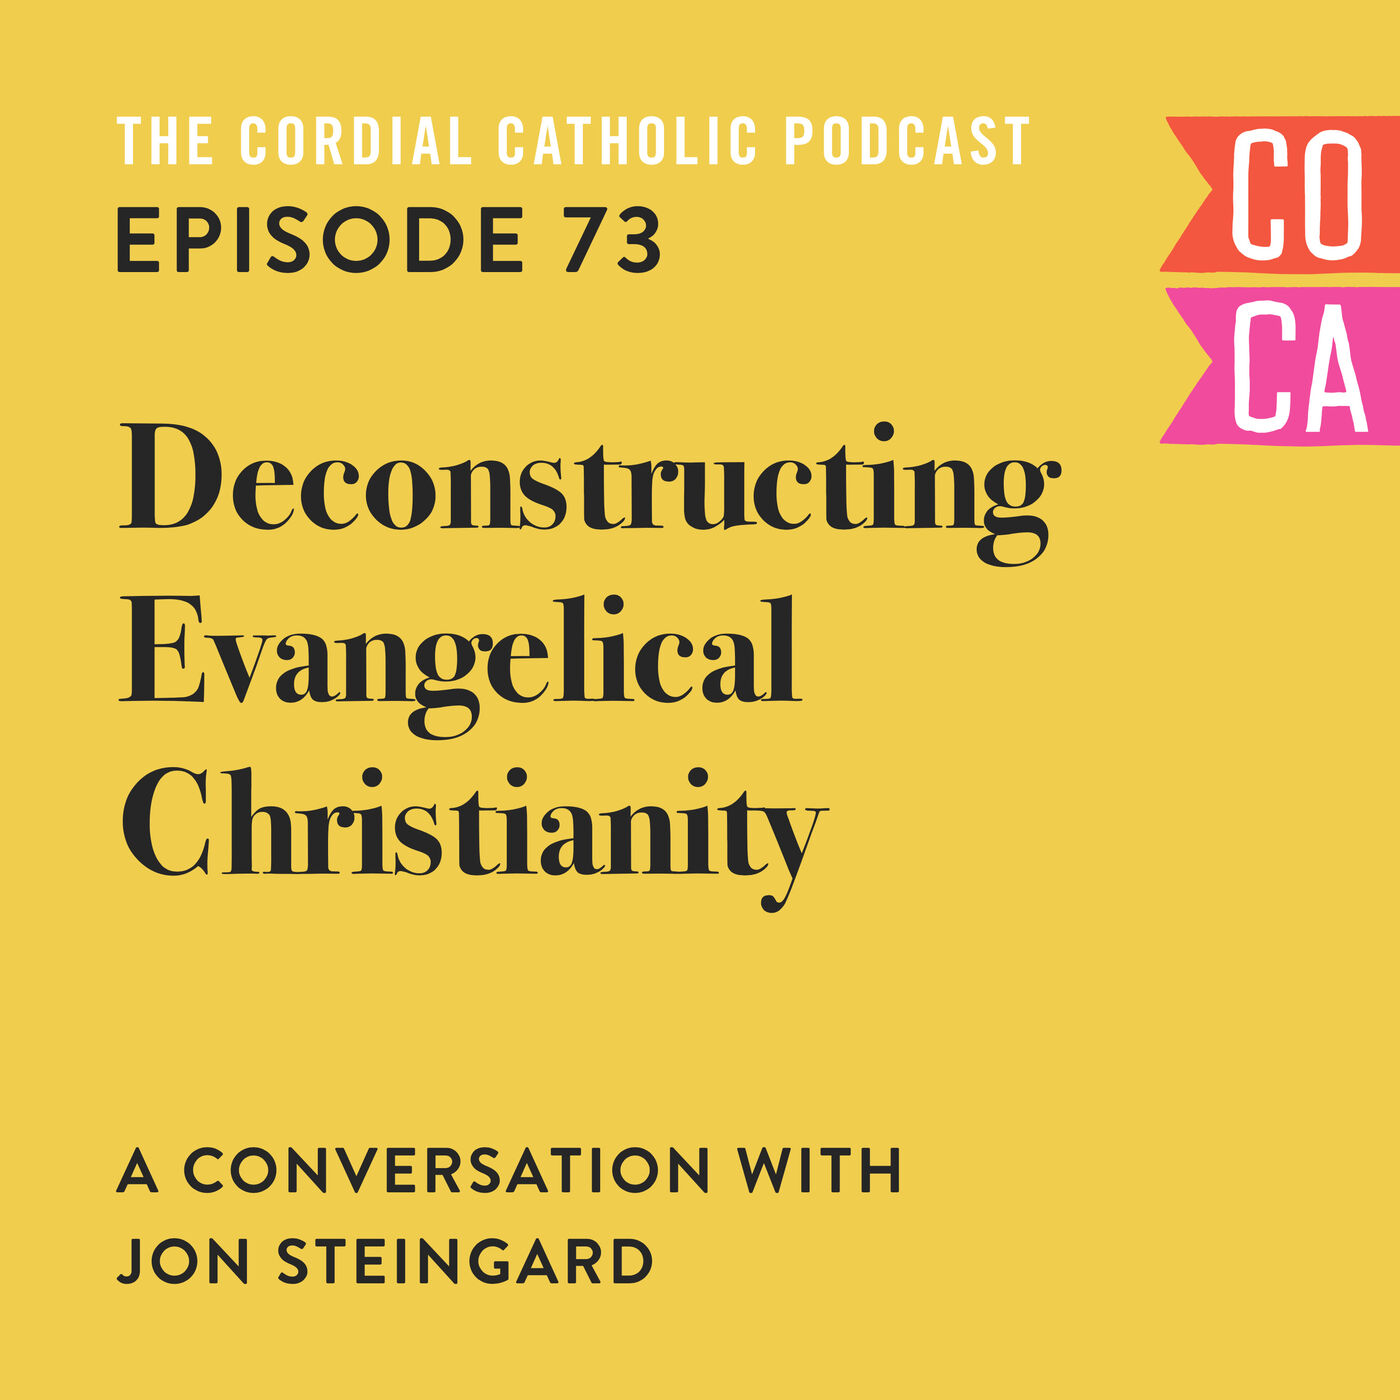 073: Deconstructing Evangelical Christianity (w/ Jon Steingard)